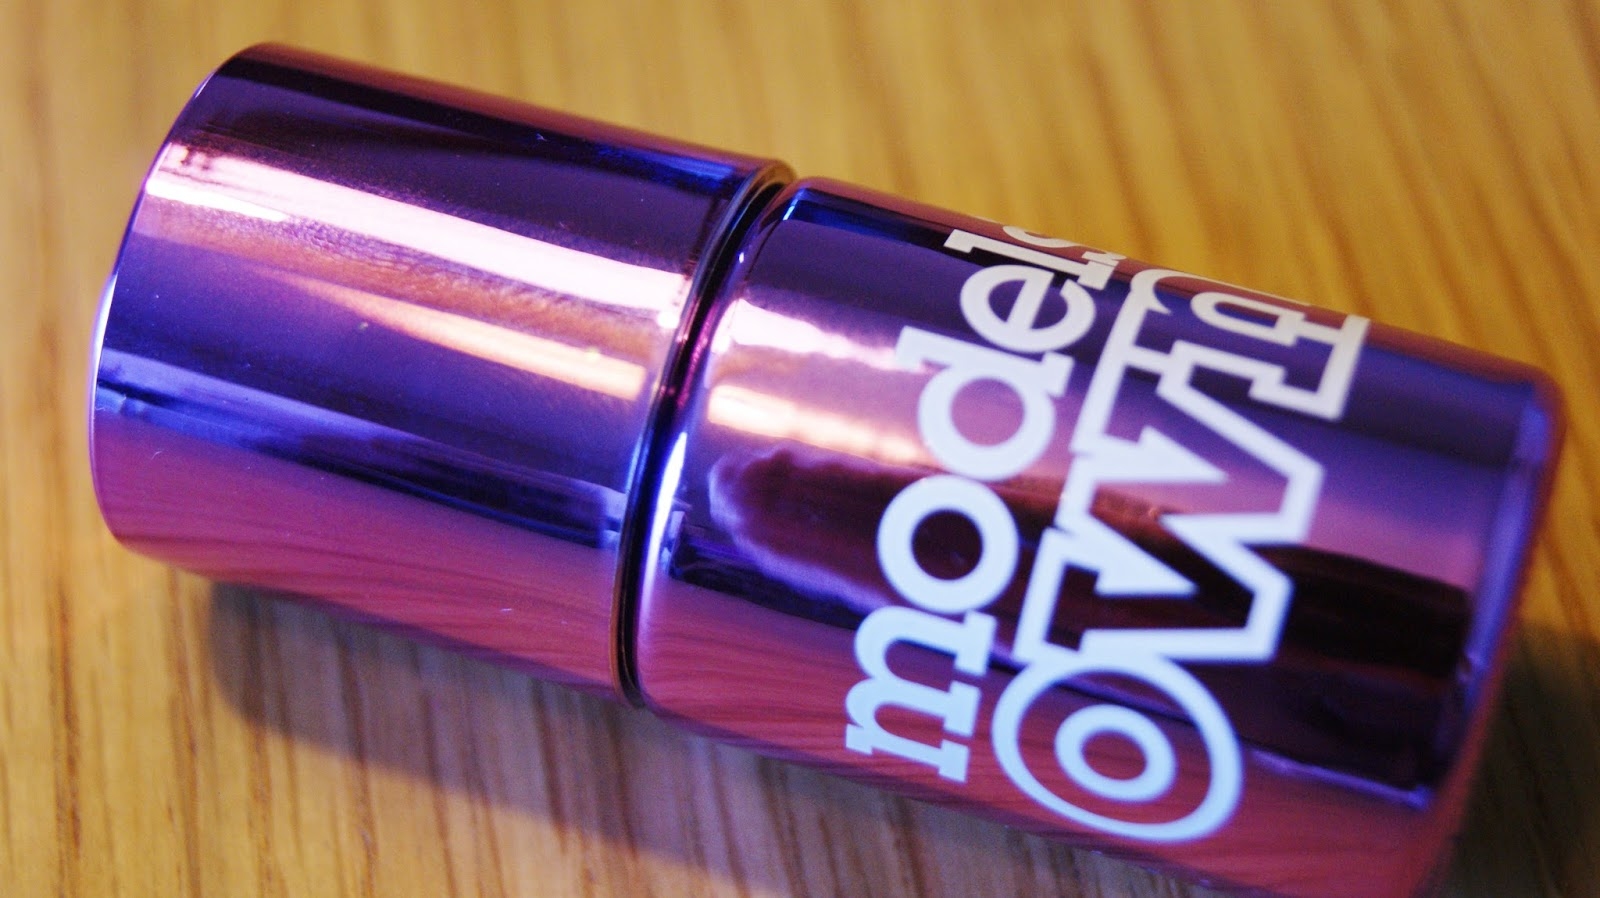 Models Own Chrome Mauve Nail Polish Bottle